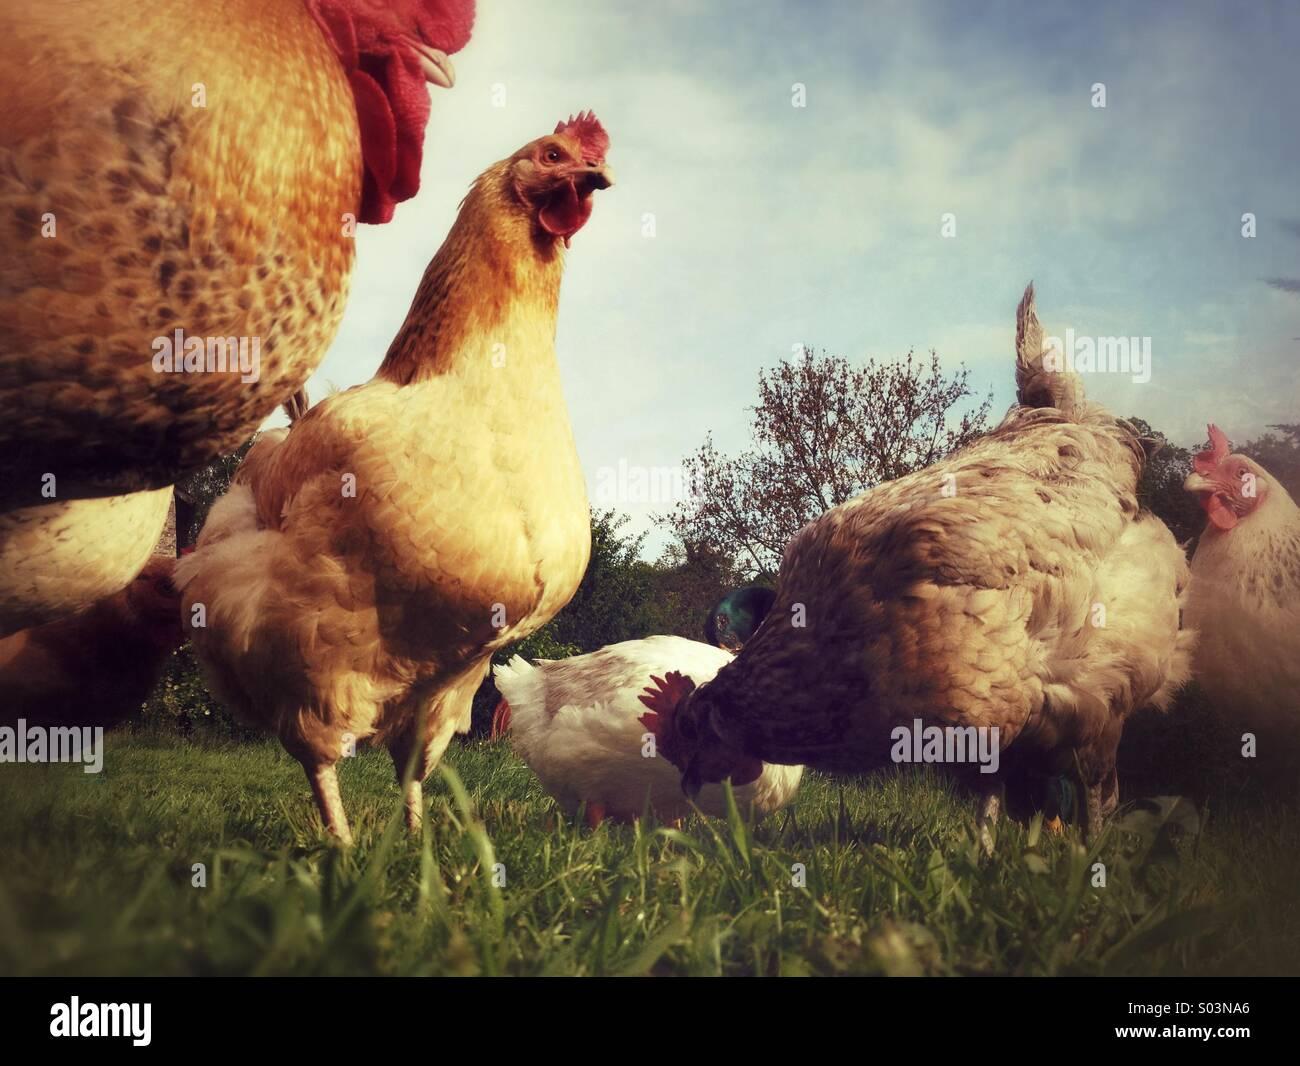 Chickens on free-range farm - Stock Image